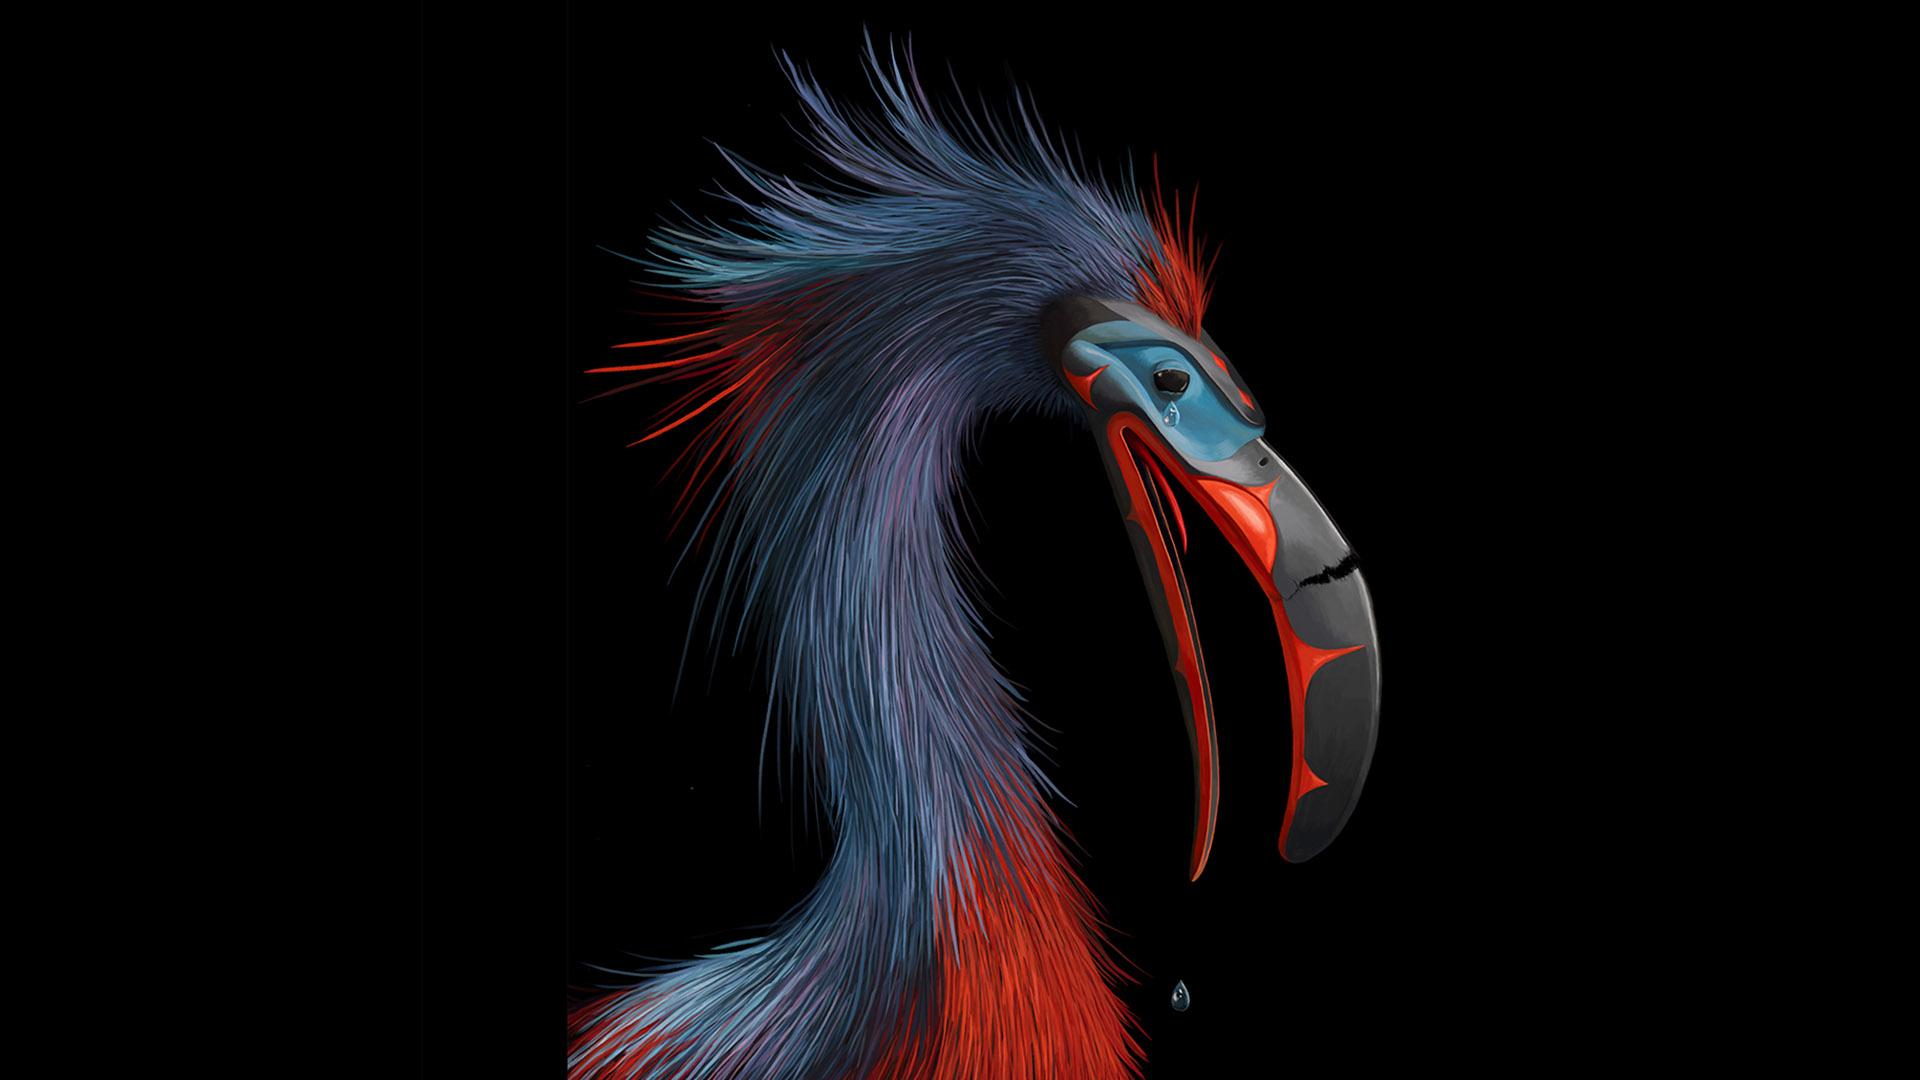 PICTOPLASMA T01 2015 THUNDERBIRD Yves